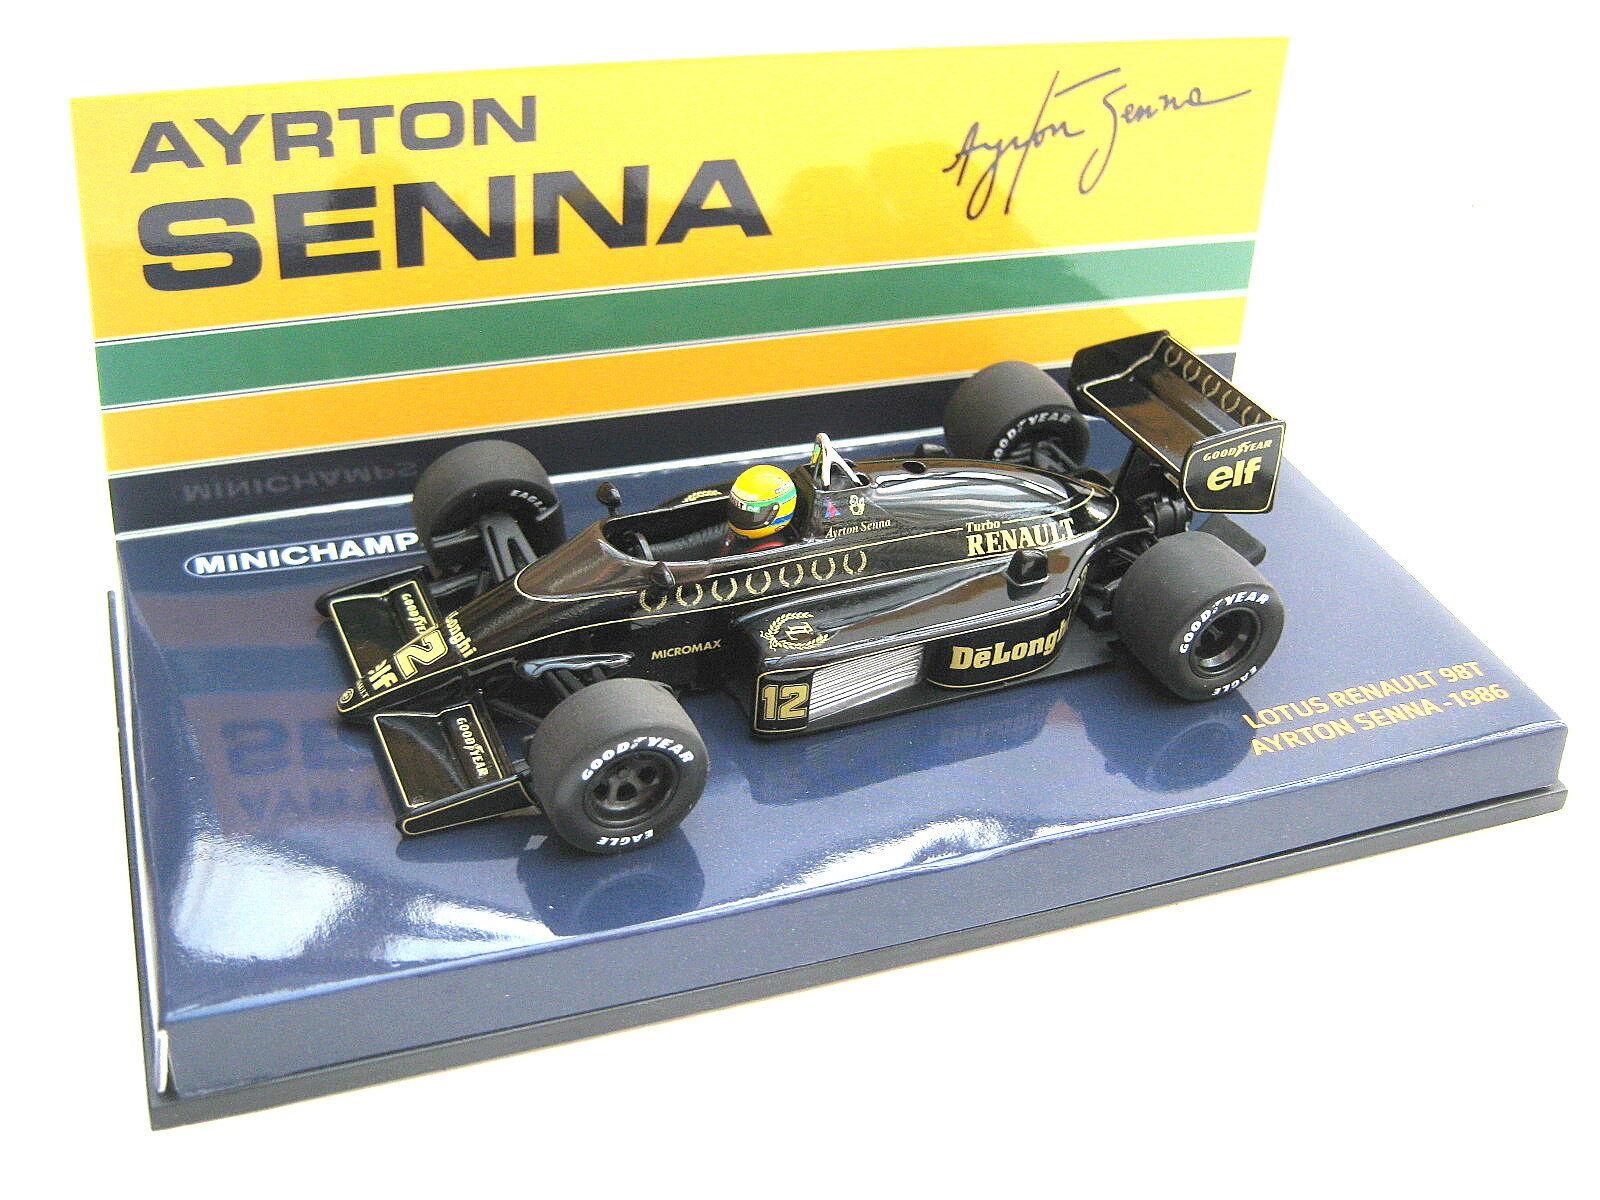 Lotus Renault f1 98 T Ayrton Senna 1986  12 World Champion PMA 540864312 1 43 neuf dans sa boîte